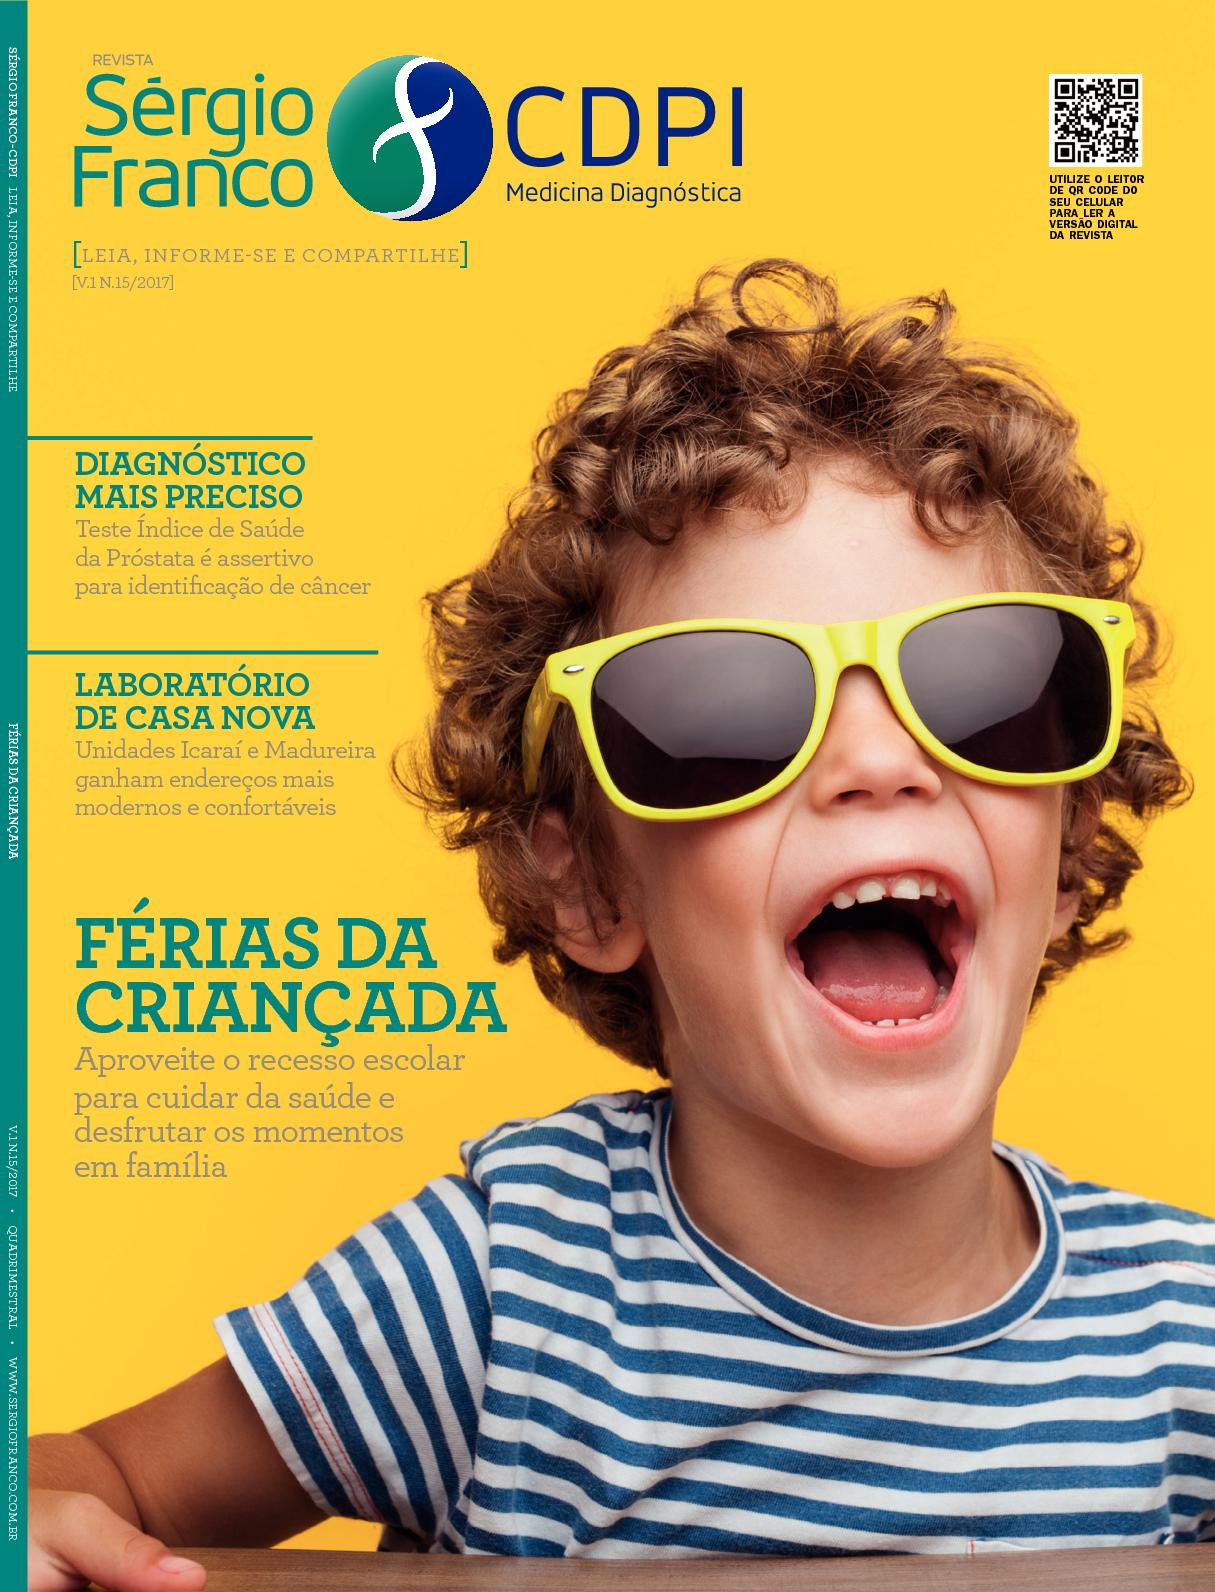 Calaméo - Sergio Franco CDPI 15 2482494cae